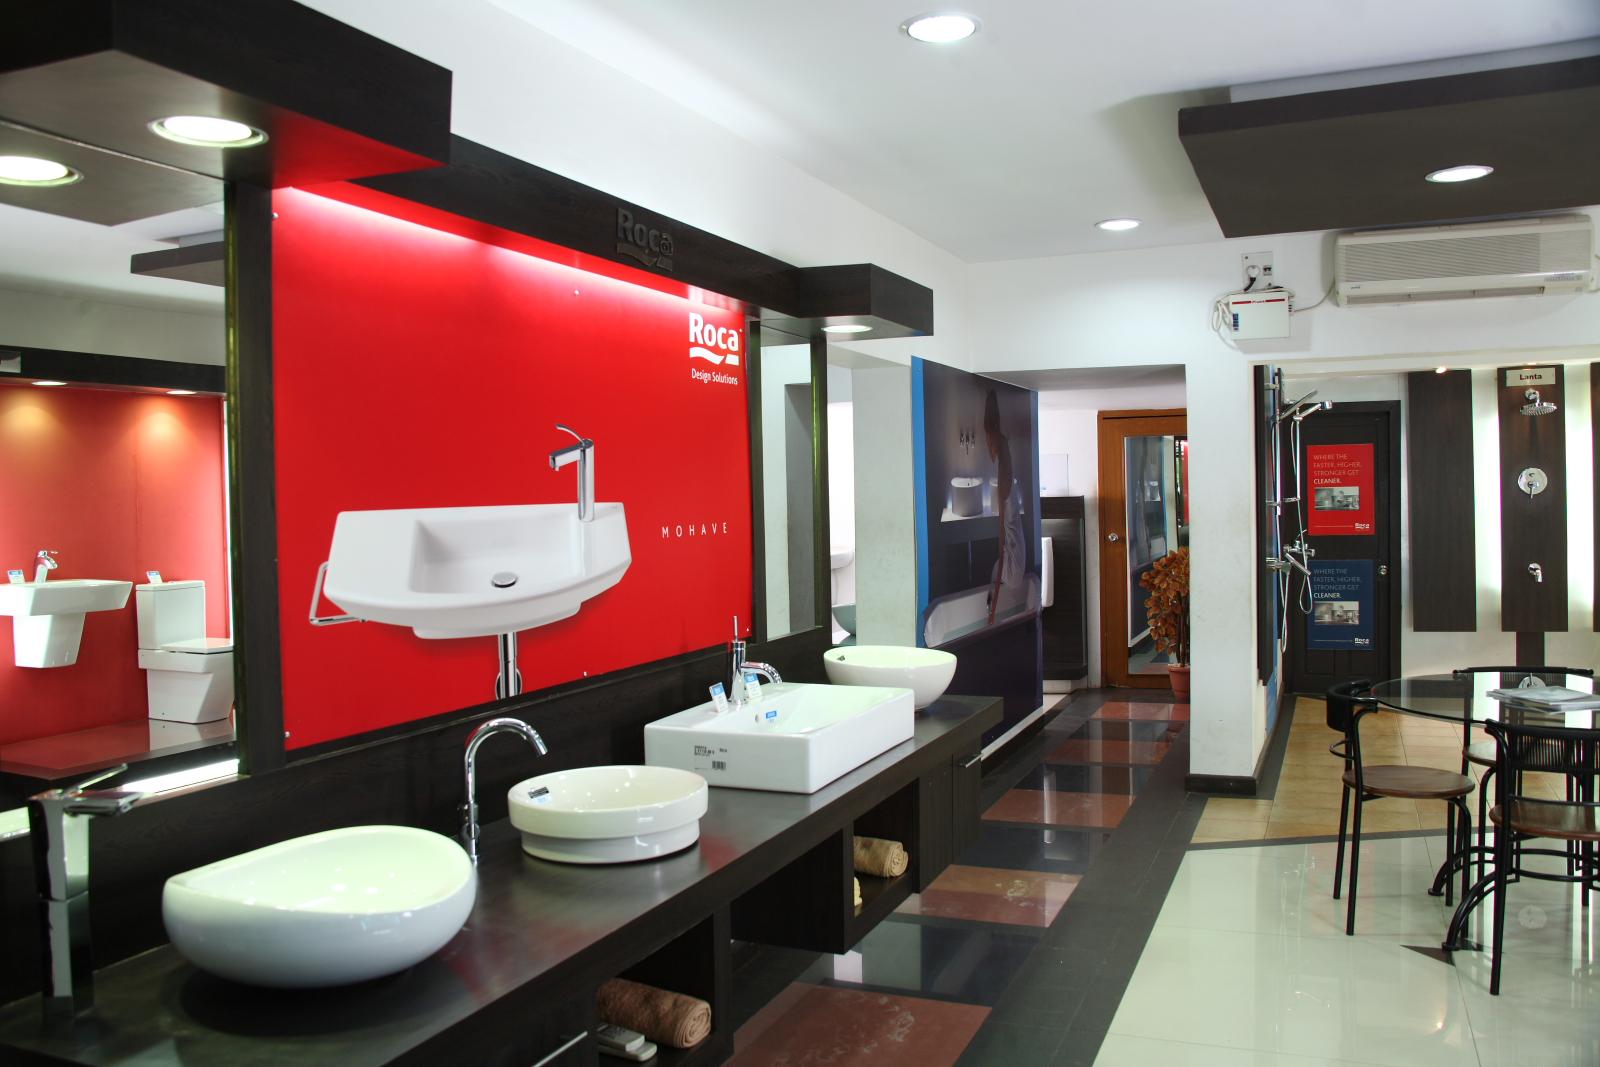 SATTAR GROUP-THE WONDERLAND OF SANITARY WAREModern Sanitary Ware Showroom